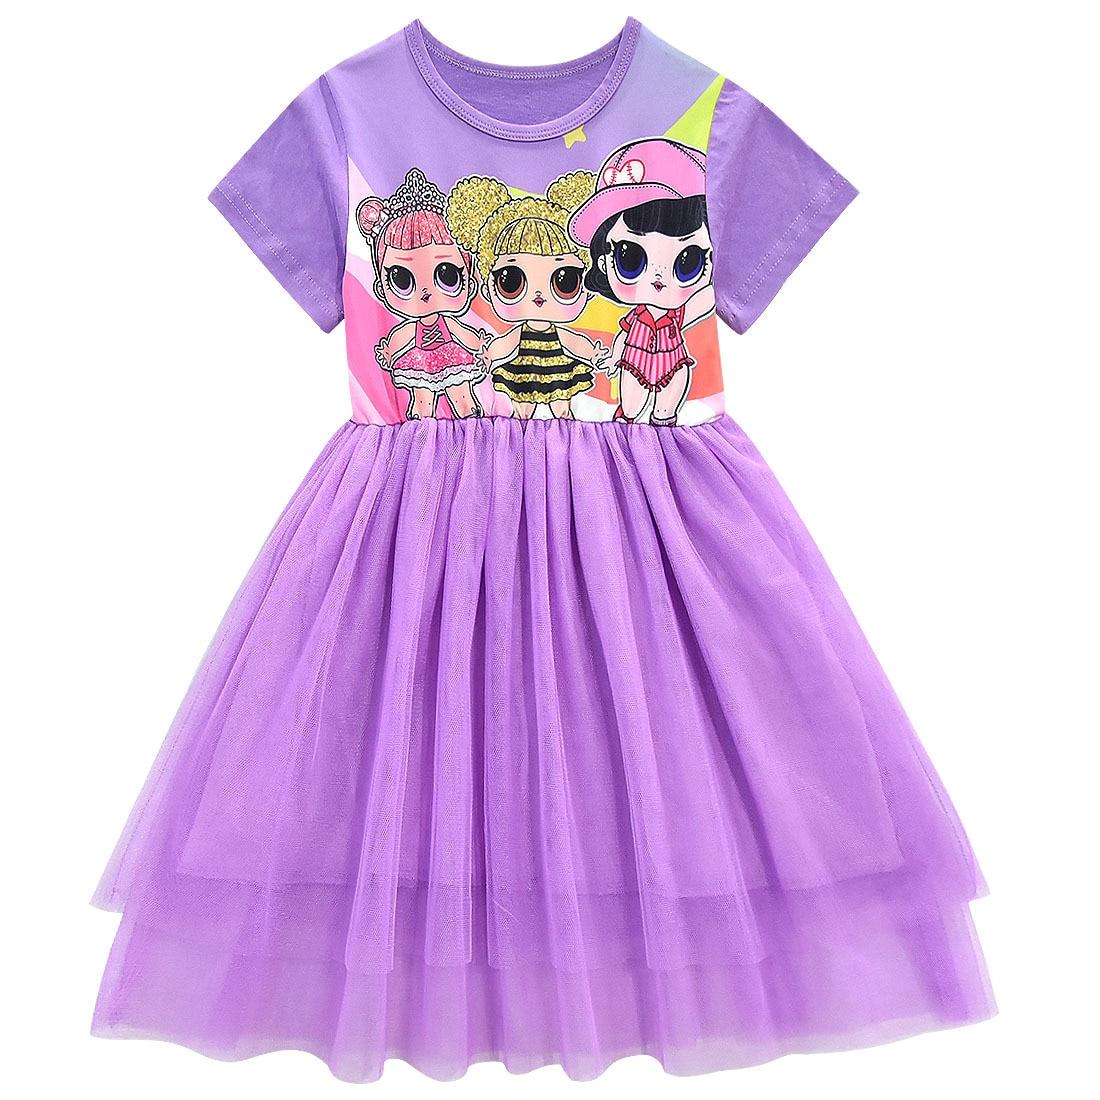 Girls Lol Dress Toddler Baby Lol Doll Clothes Kids Cartoon Print Princess Dress Children Short Sleeve Birthday Vestido for Girl 5